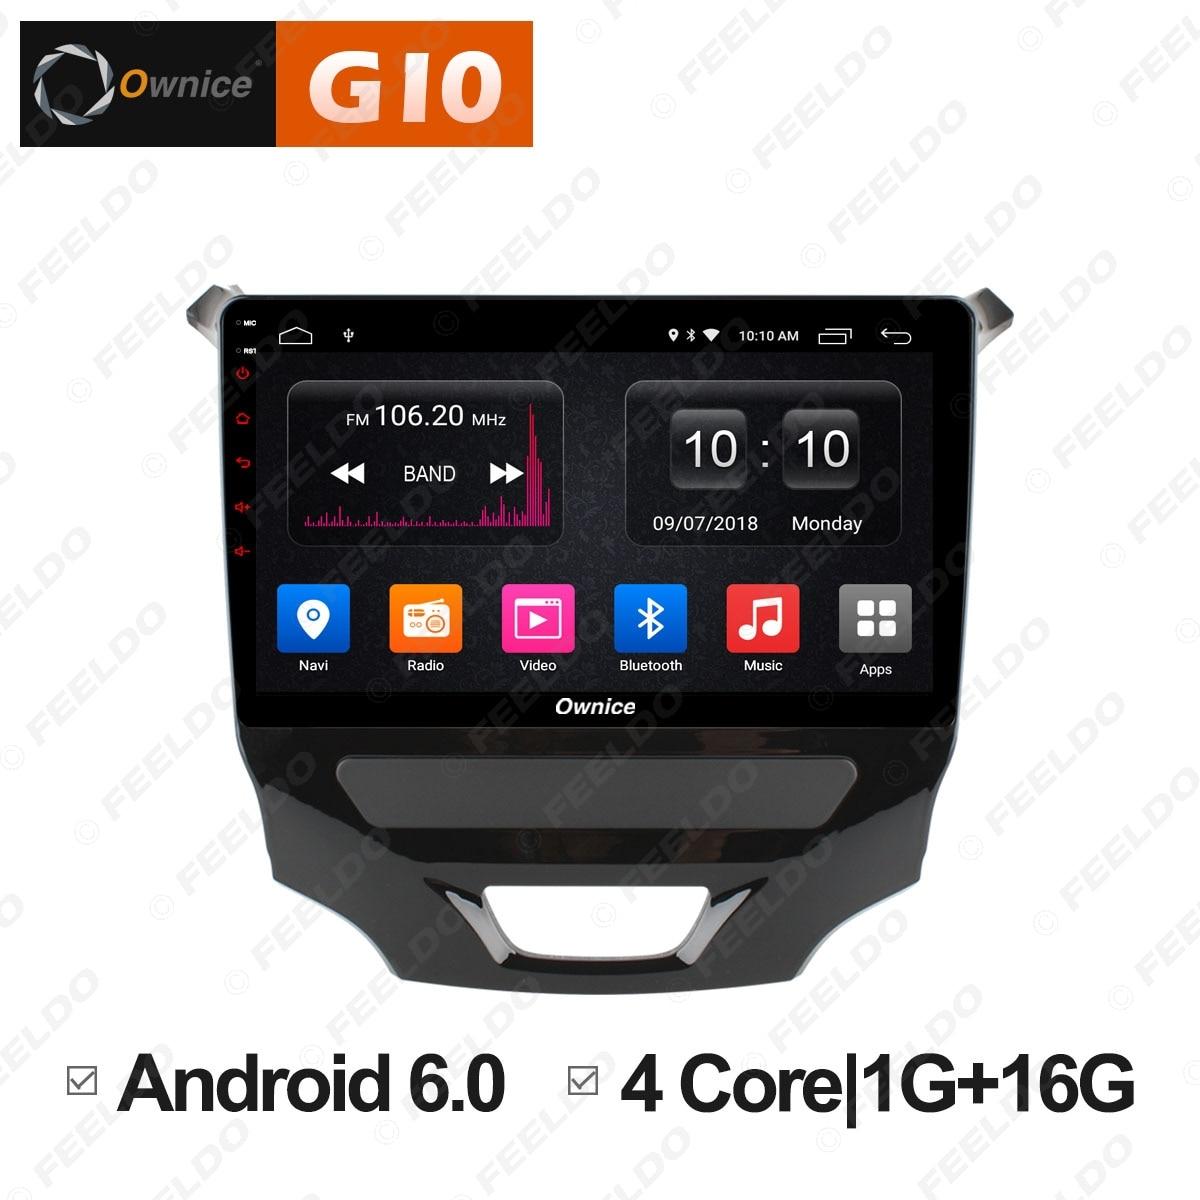 "FEELDO 9 ""2.5D Nano IPS pantalla Android 6,0 Octa Core/DDR3 2G/32G/4G LTE reproductor multimedia para coche con GPS/FM/AM RDS para Cruze 2015"